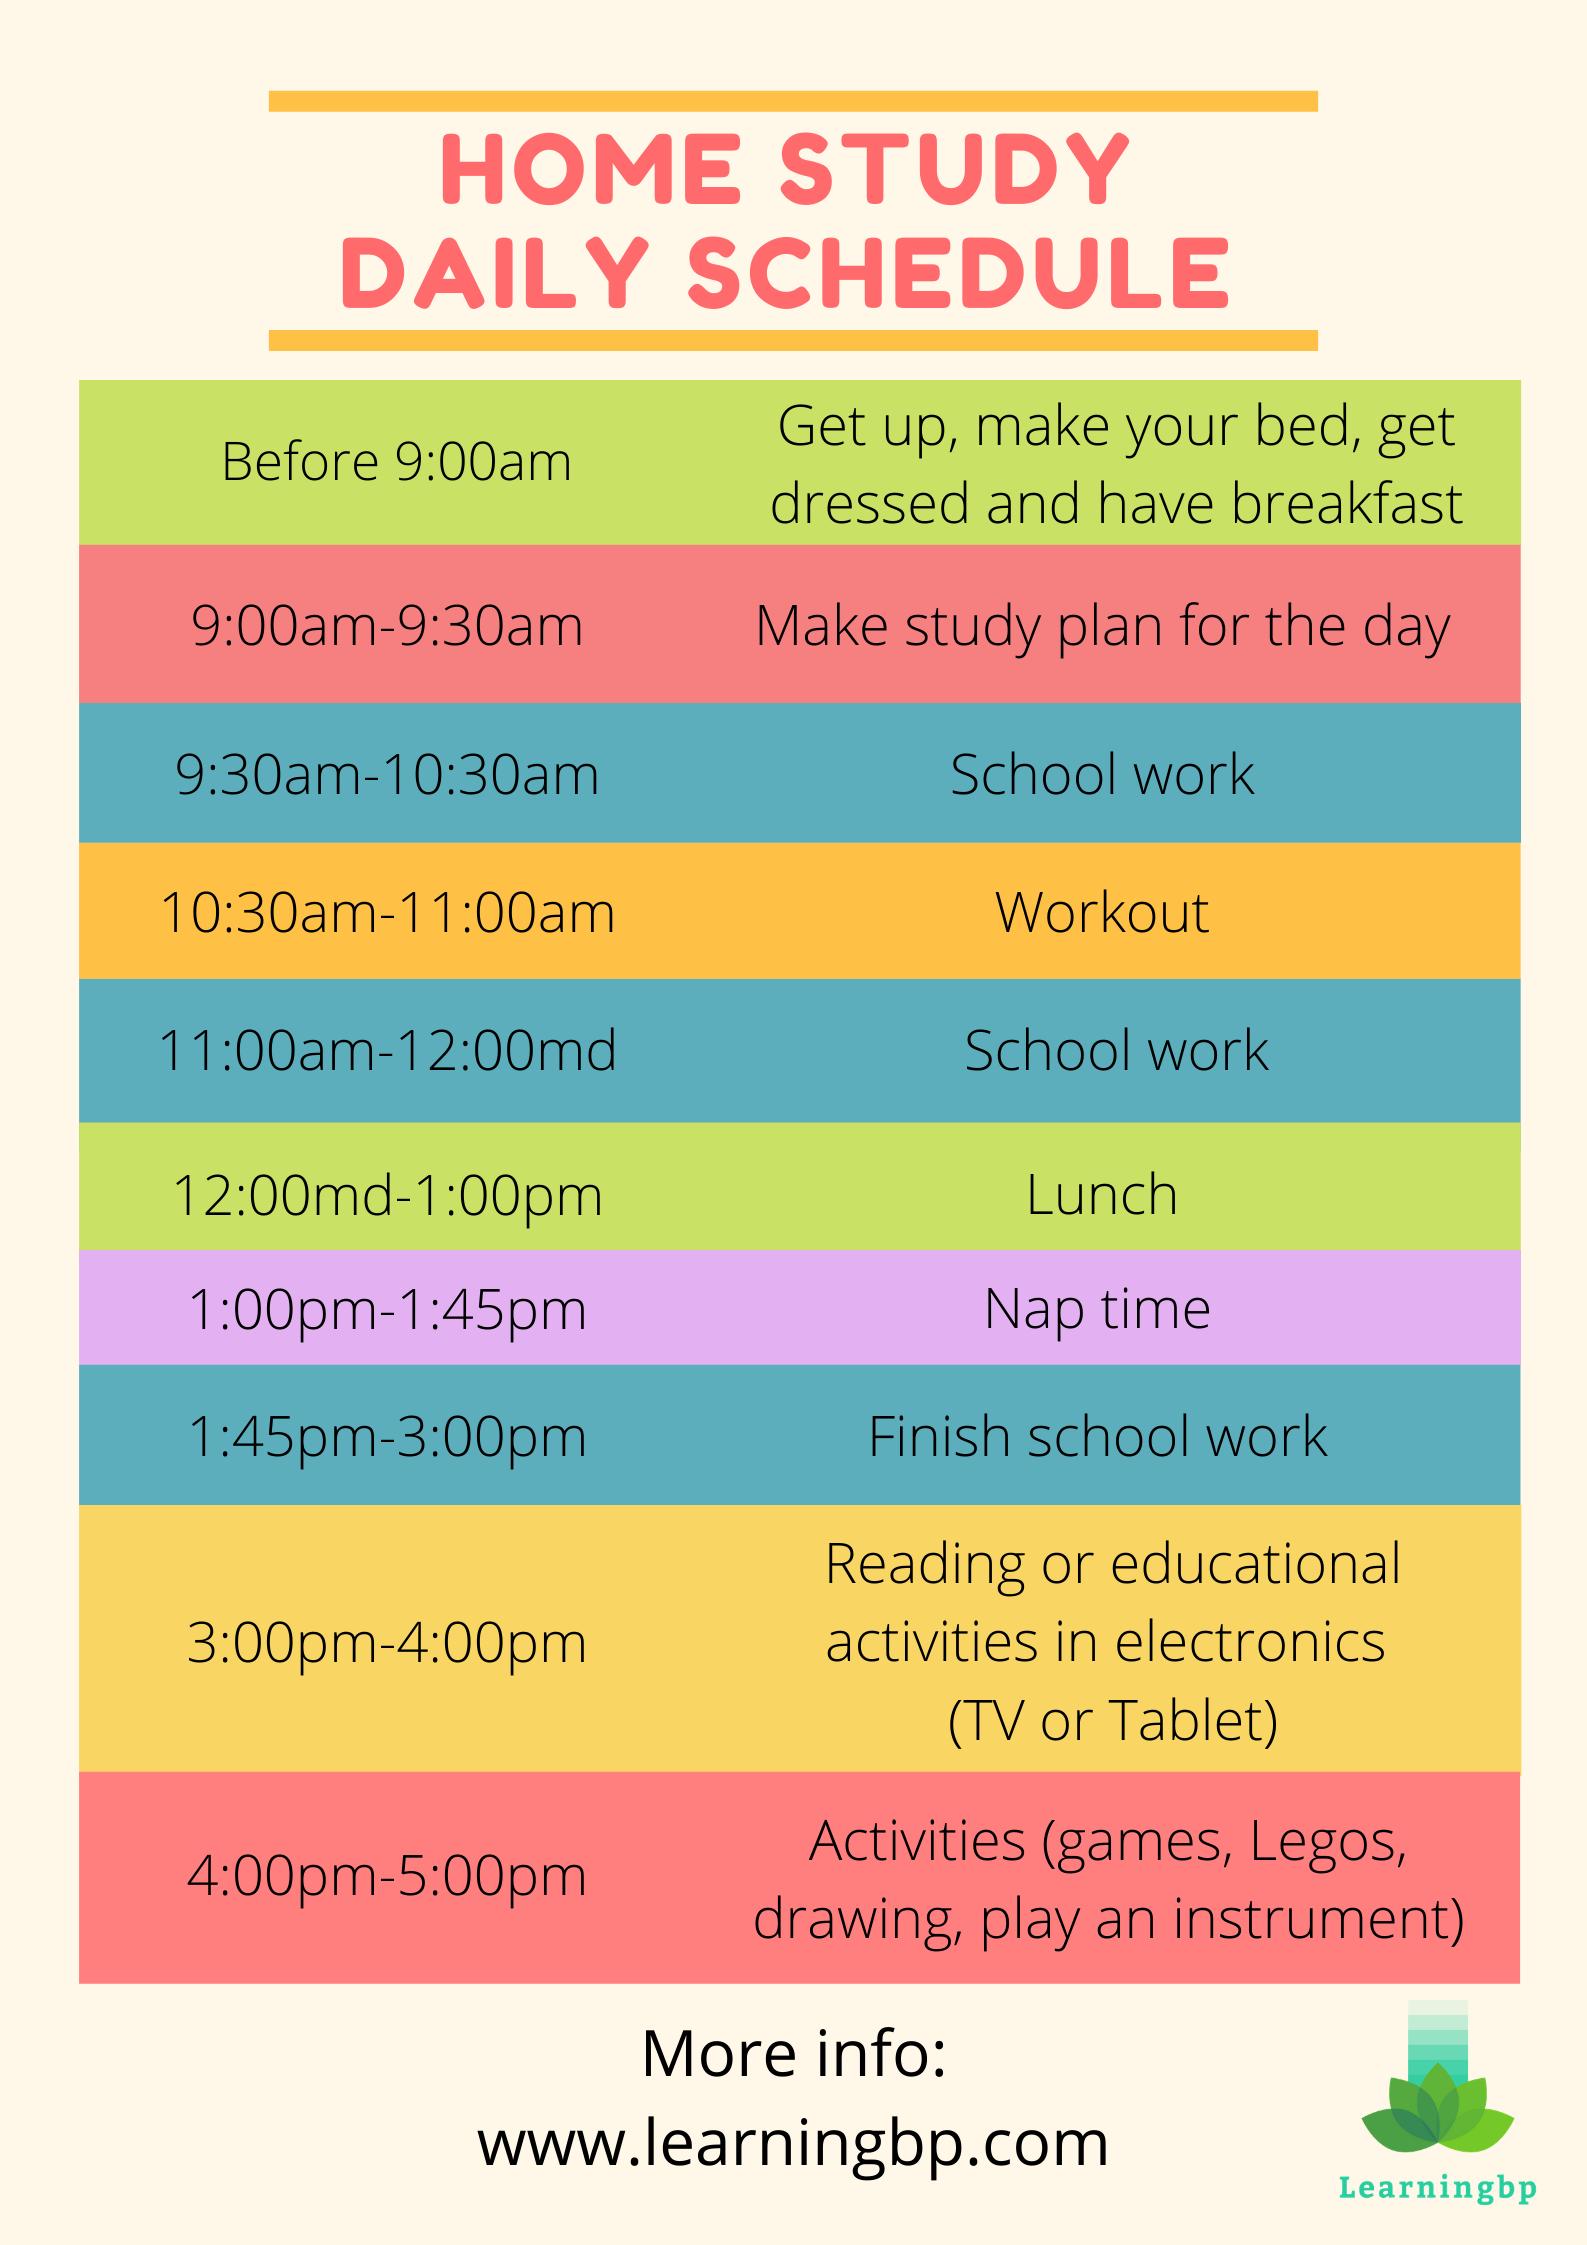 Home Study Daily Schedule In 2020 School Schedule Online School Organization School Routines